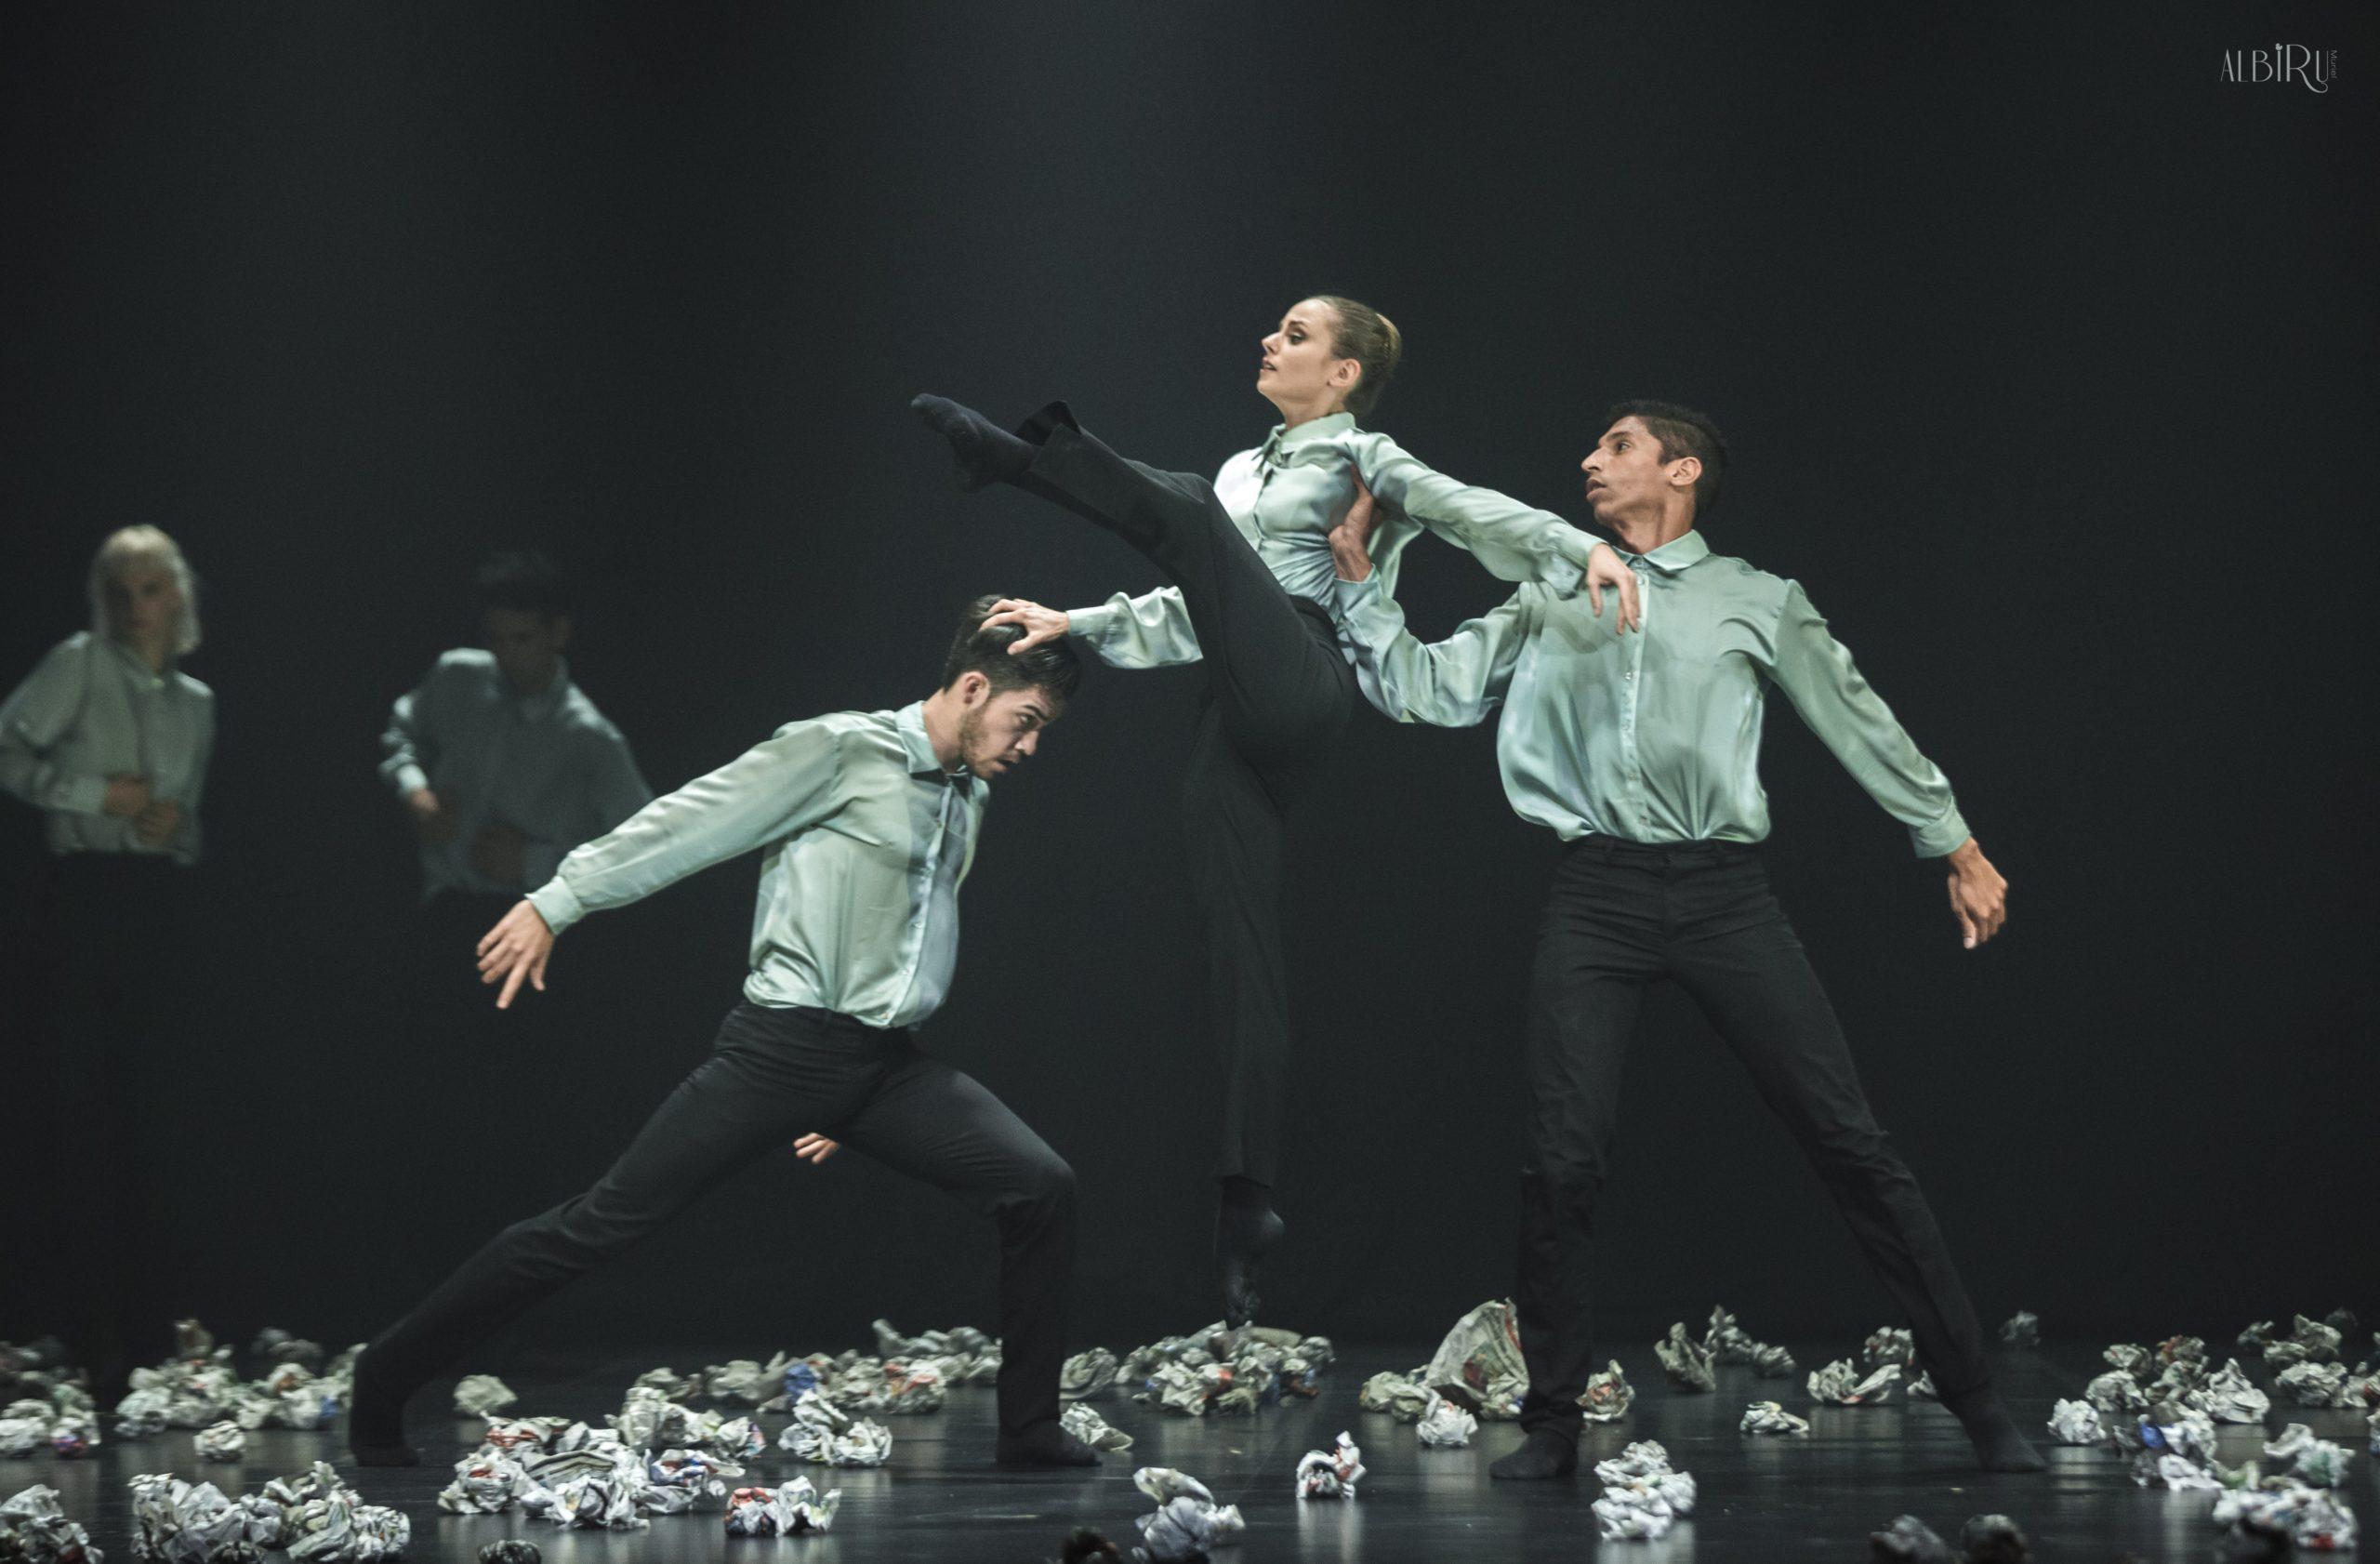 Tongues ¡Bravo! Ballet de Barcelona  Foto: Alba Muriel